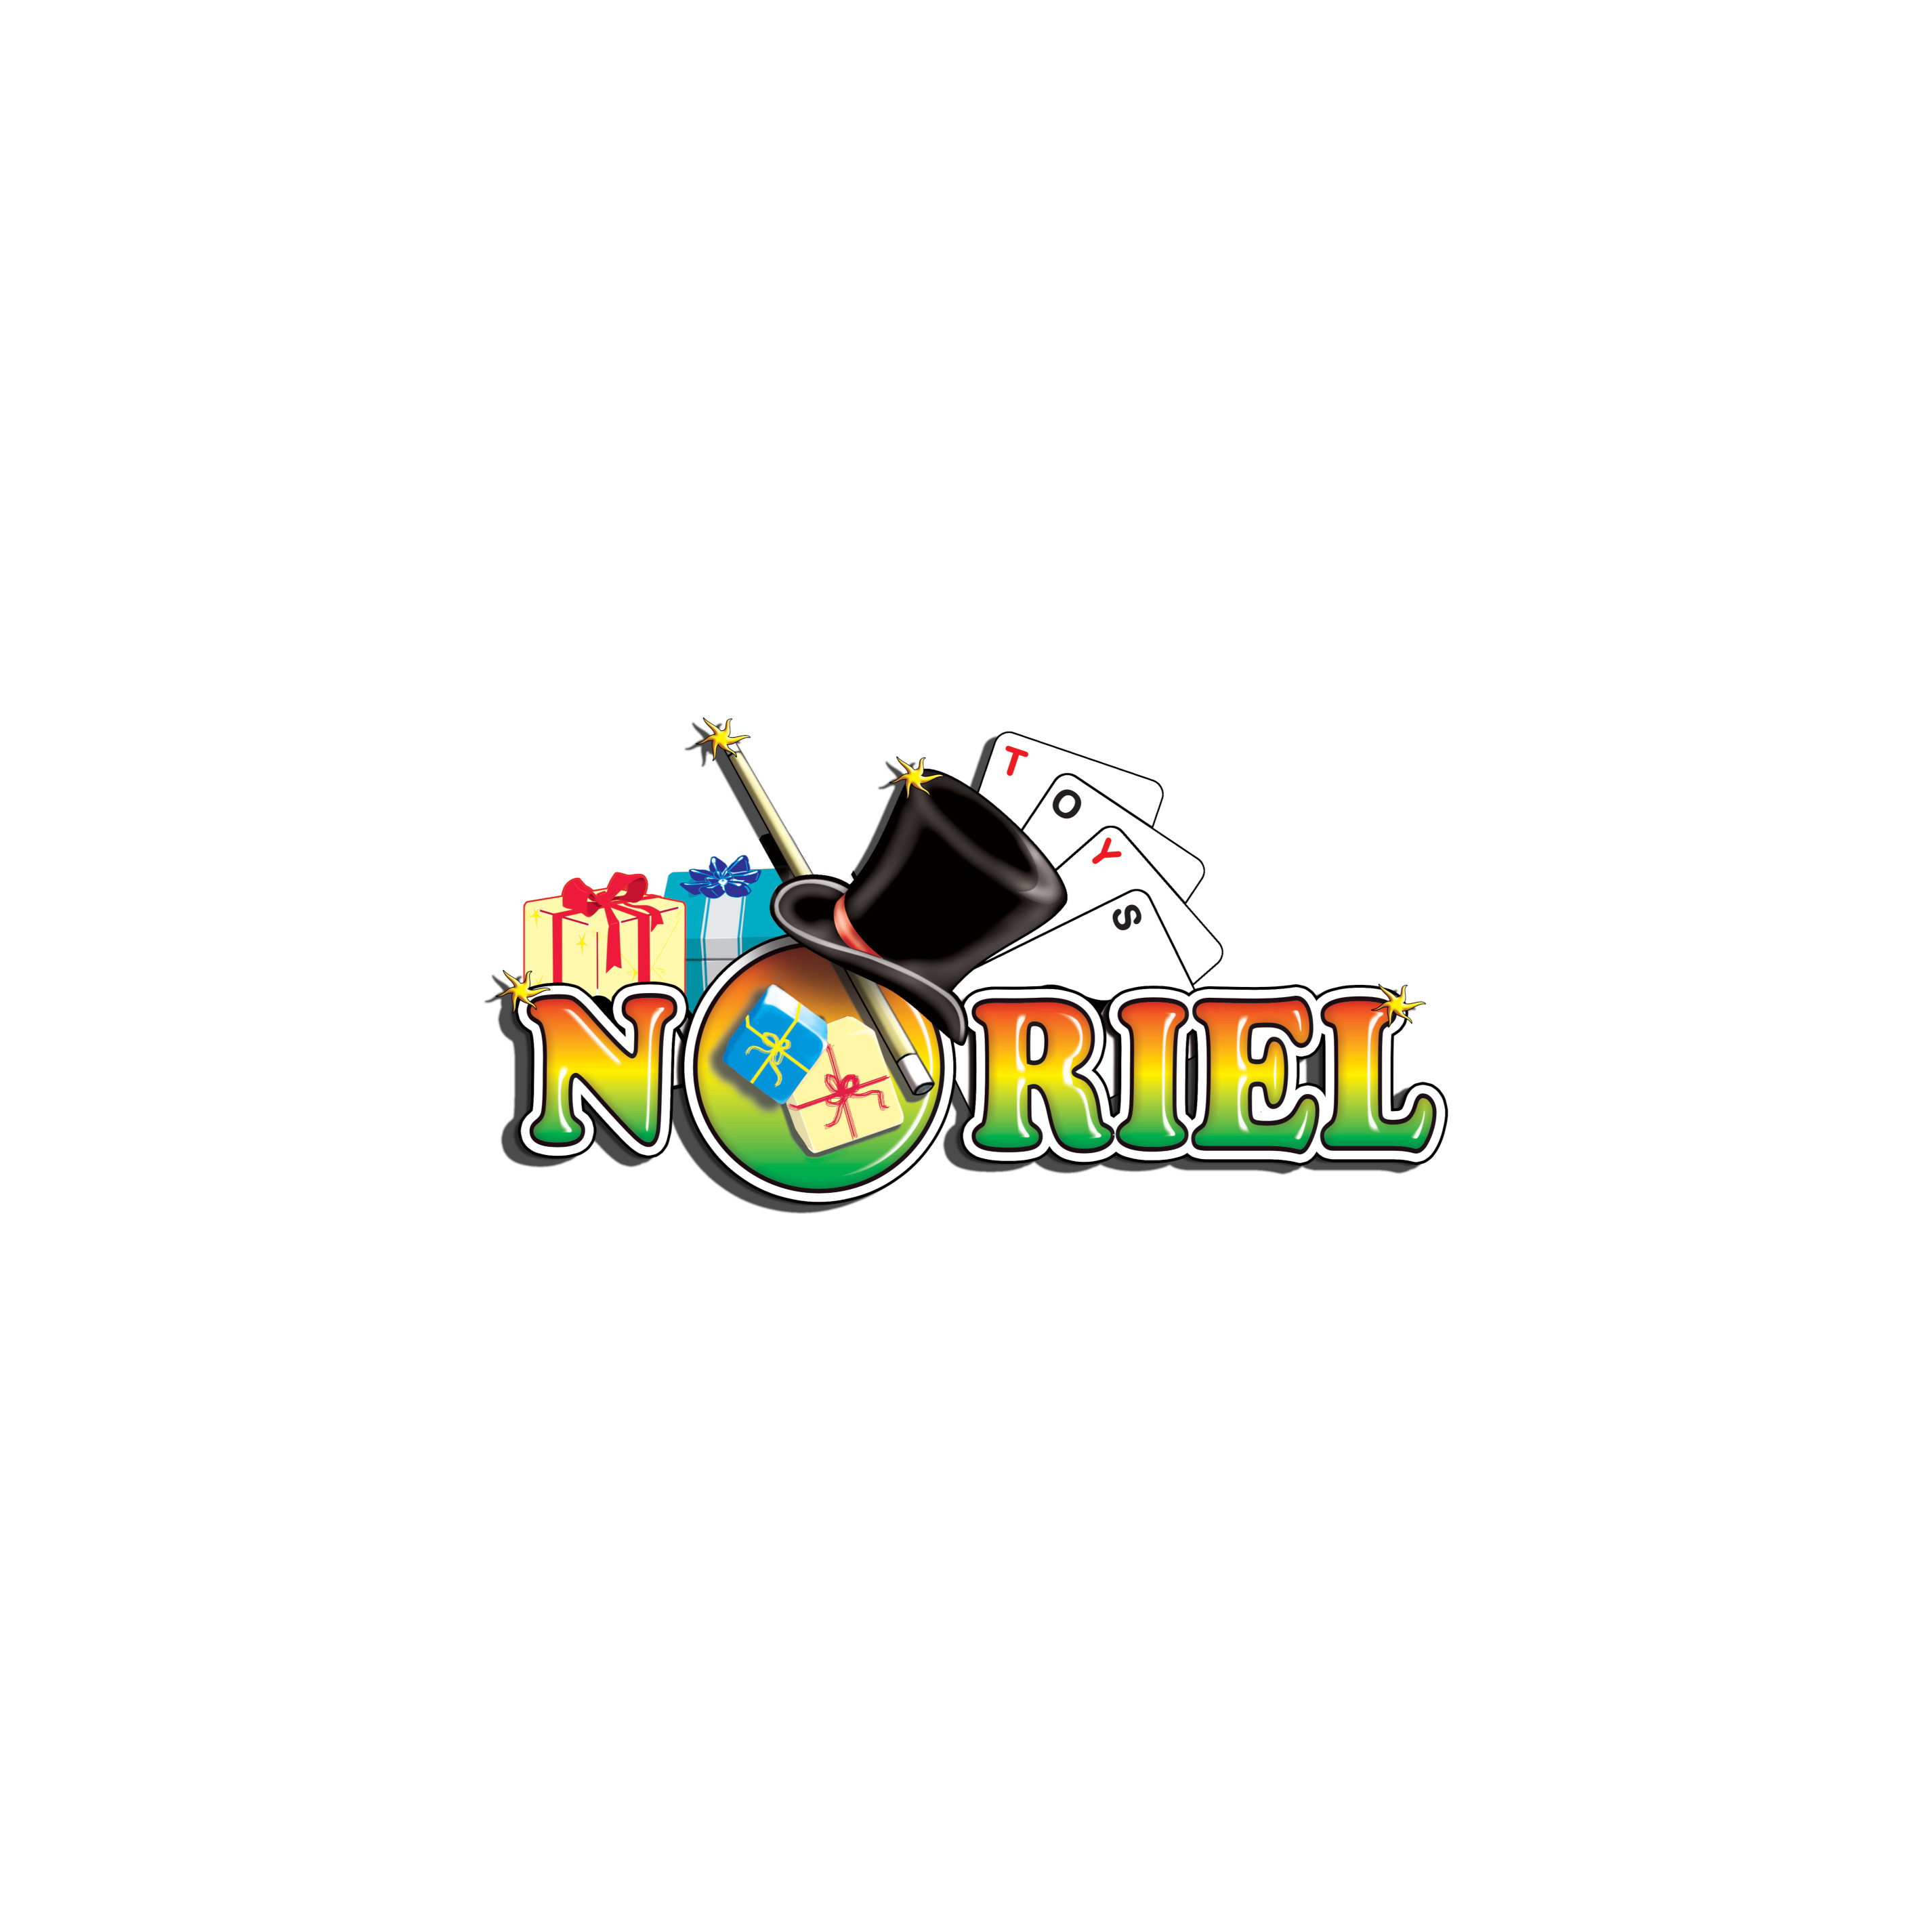 DK000562545_001w Penar tubular Disney Mickey, Minnie Mouse, 20 x 6.5 cm